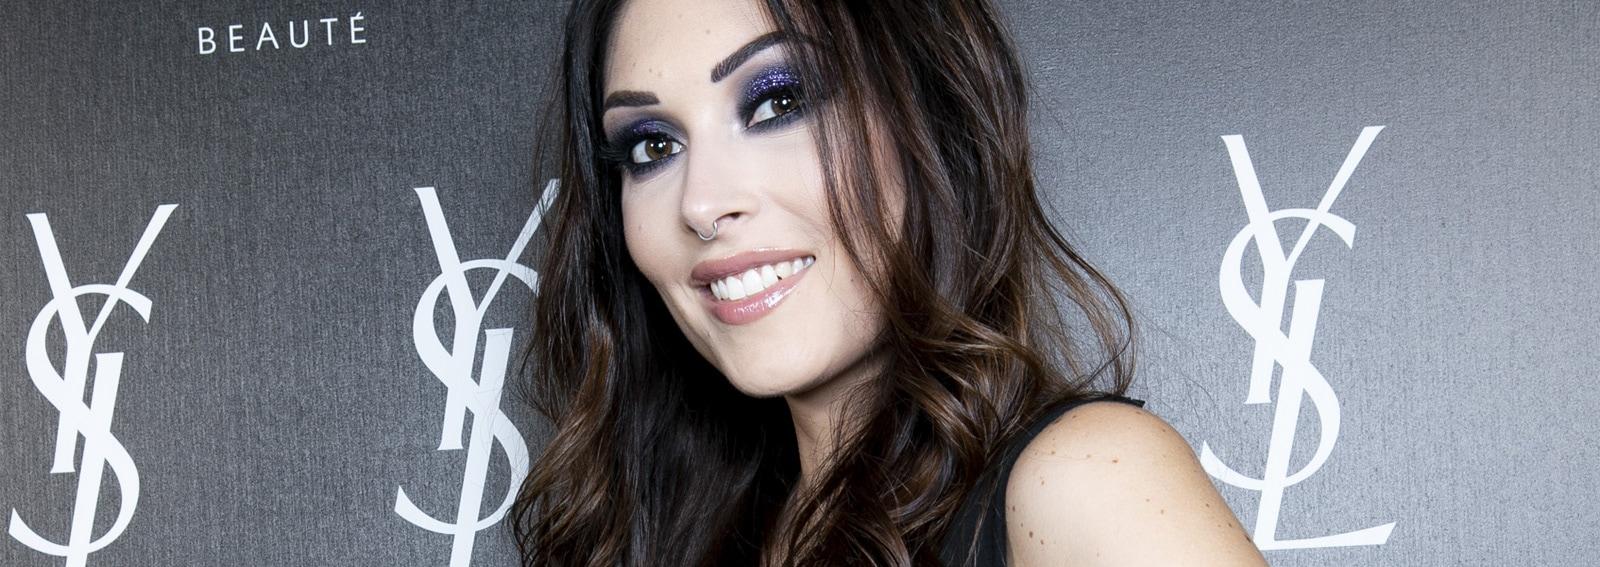 cherylpandemonium-carlotta-giacuzzo-beauty-look-make-up-capelli-stile-cover-desktop